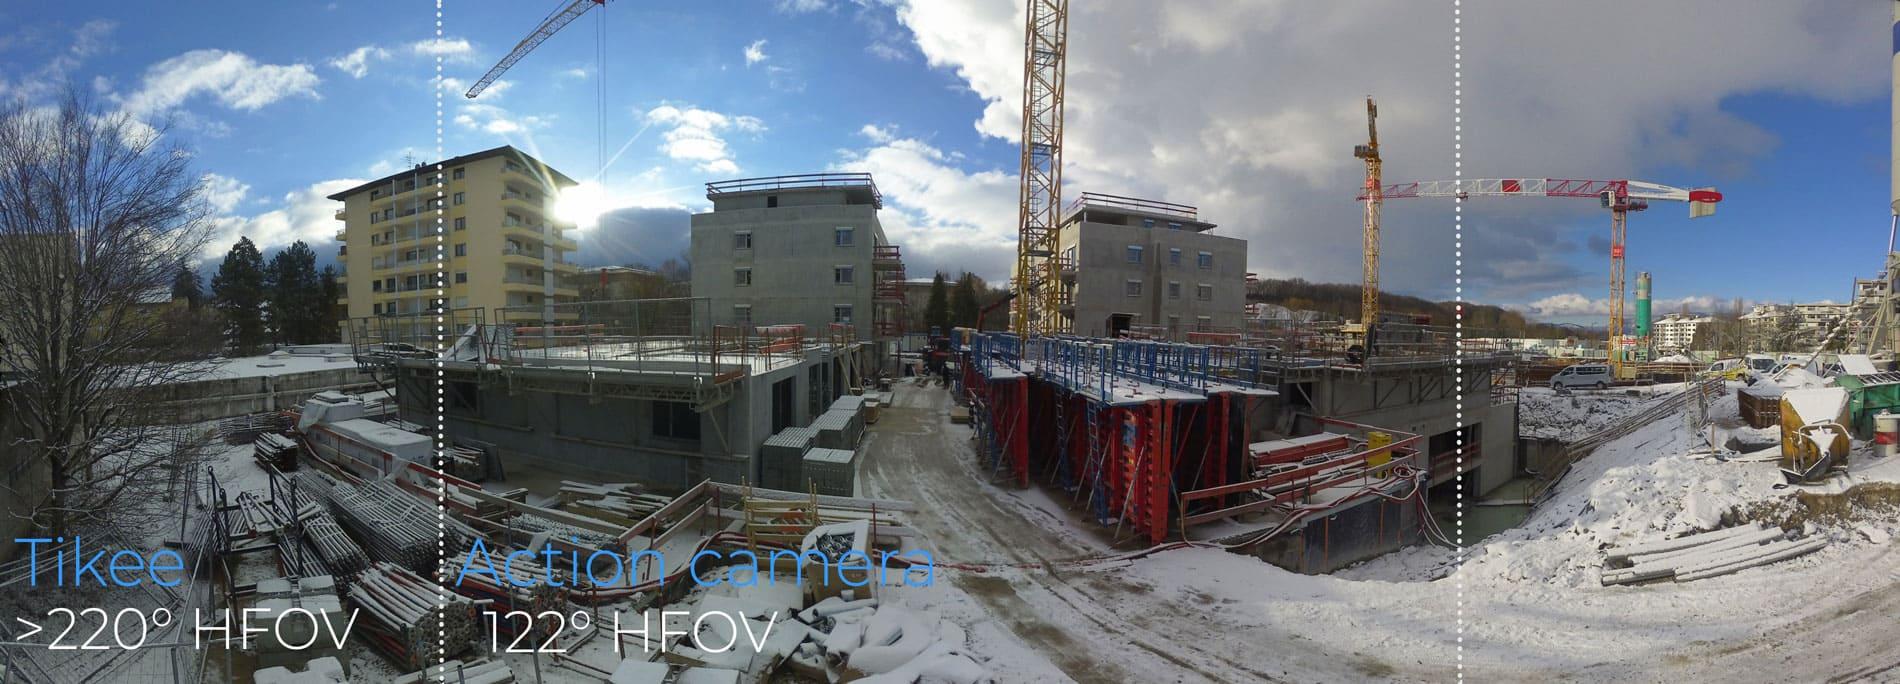 HFOV slide1